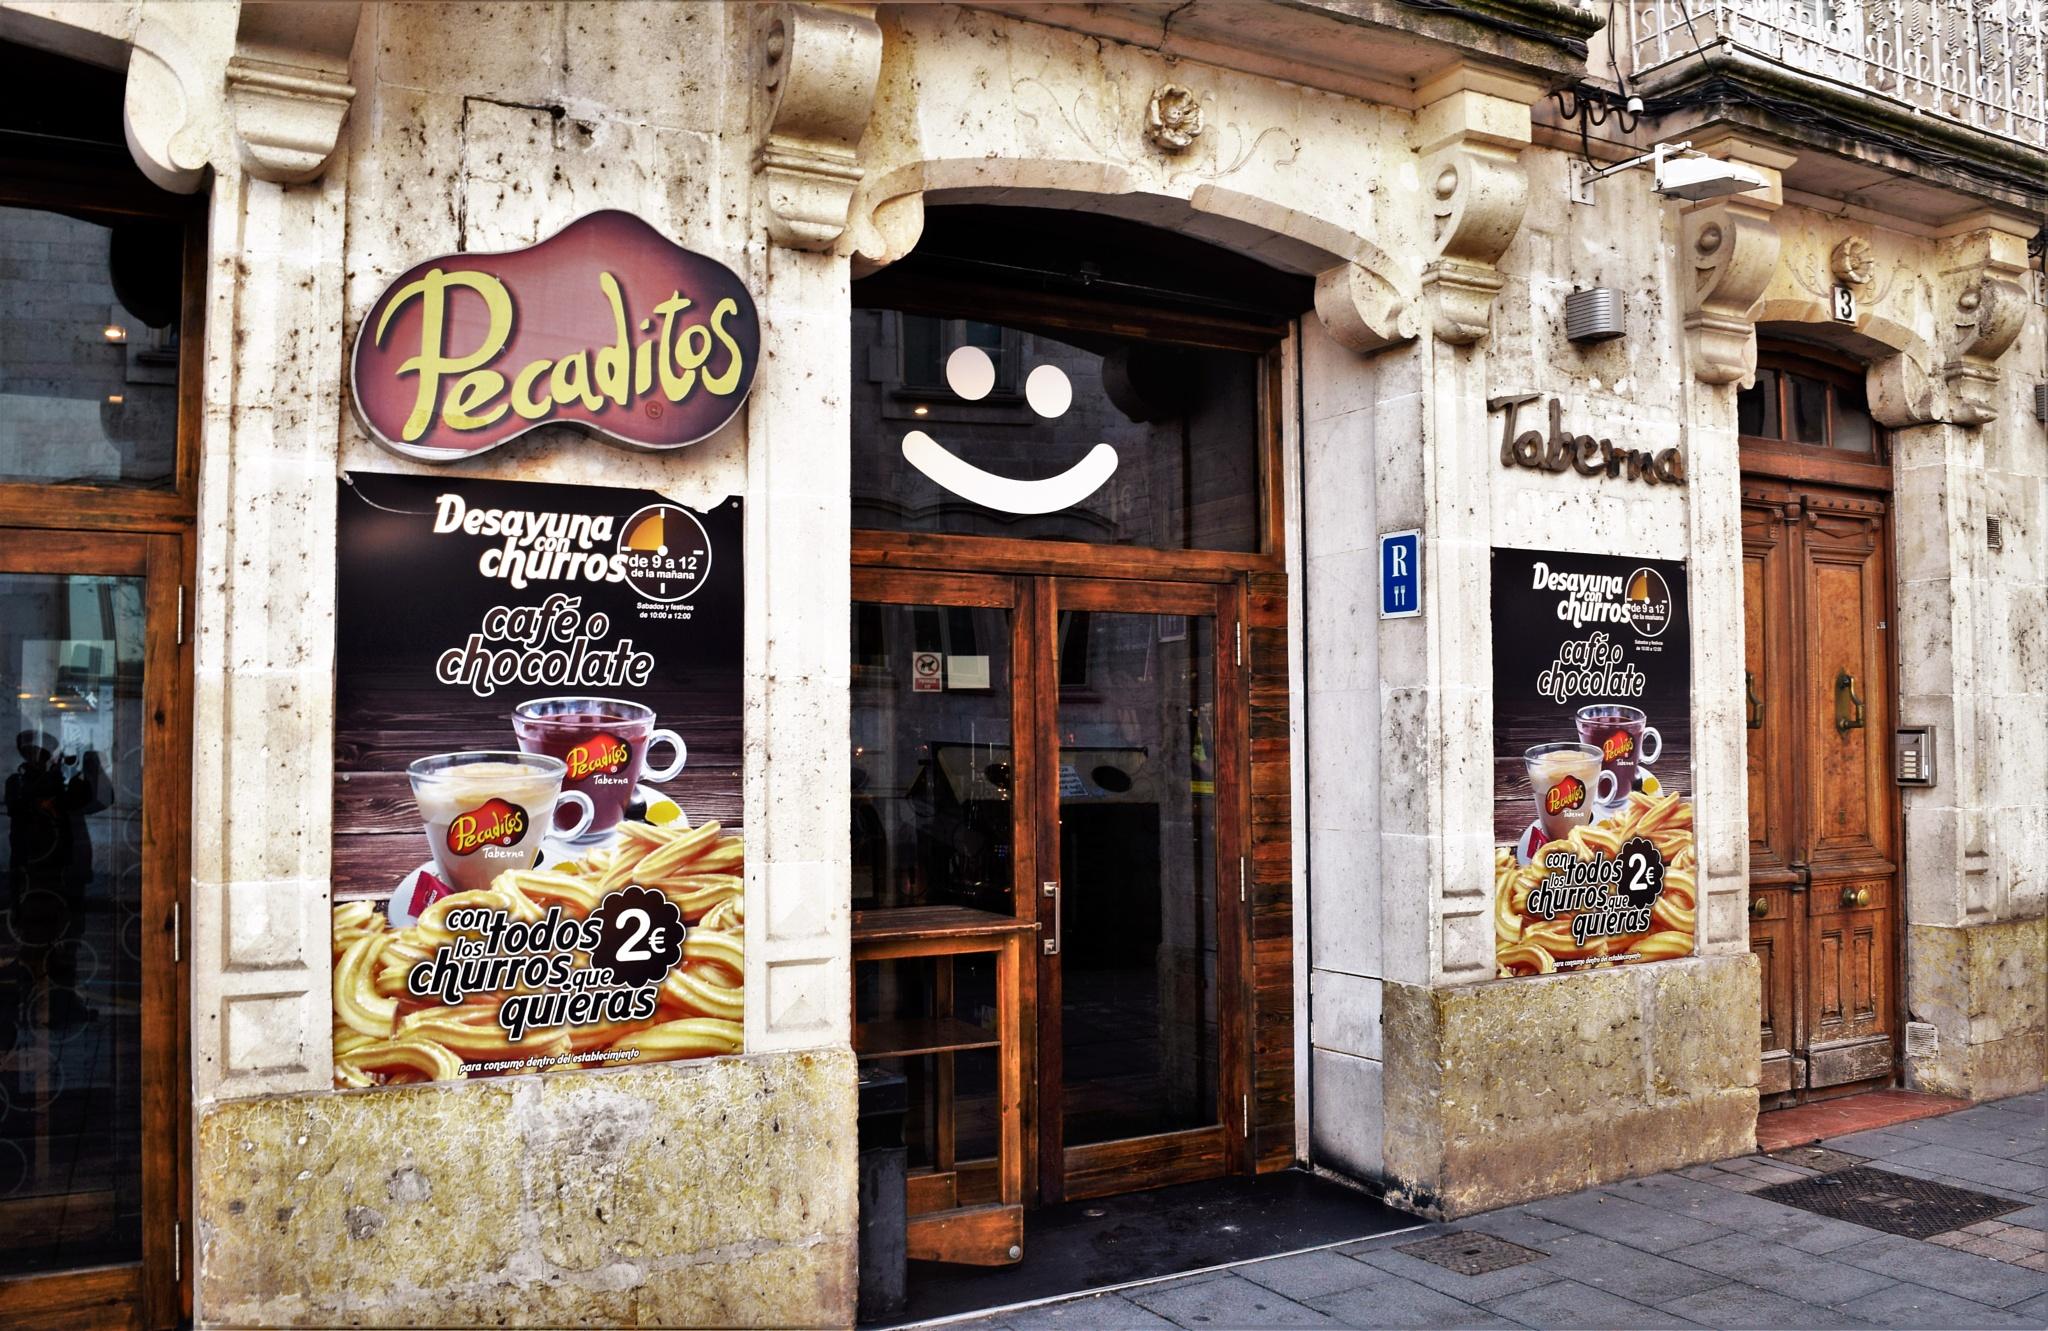 Smiley Cafe by Leonardo Penaranda